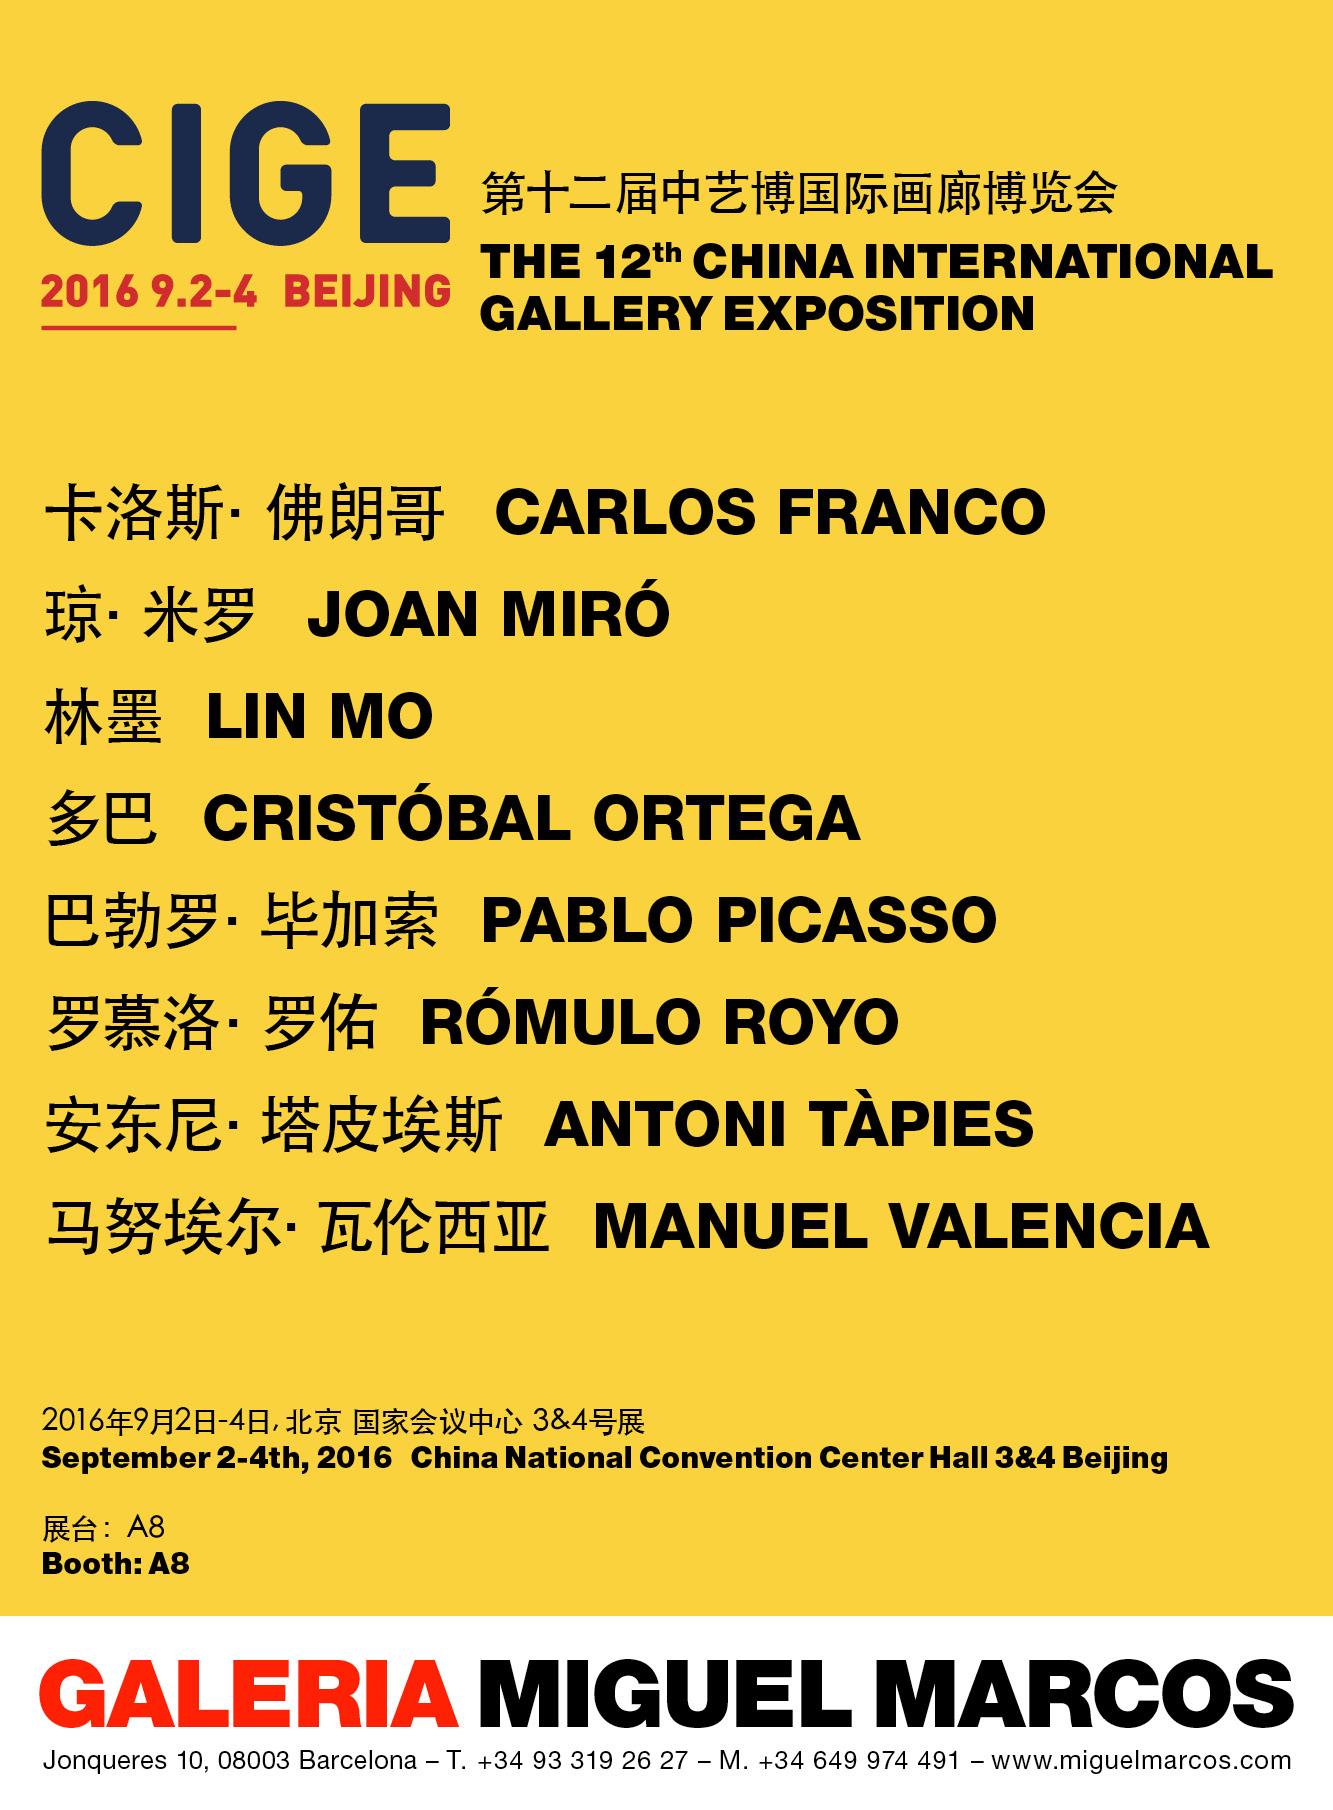 romulo_royo_miguel_marcos_art_painting_modernart_cige-fair_exposition_gallery_chinainternational-_beijing